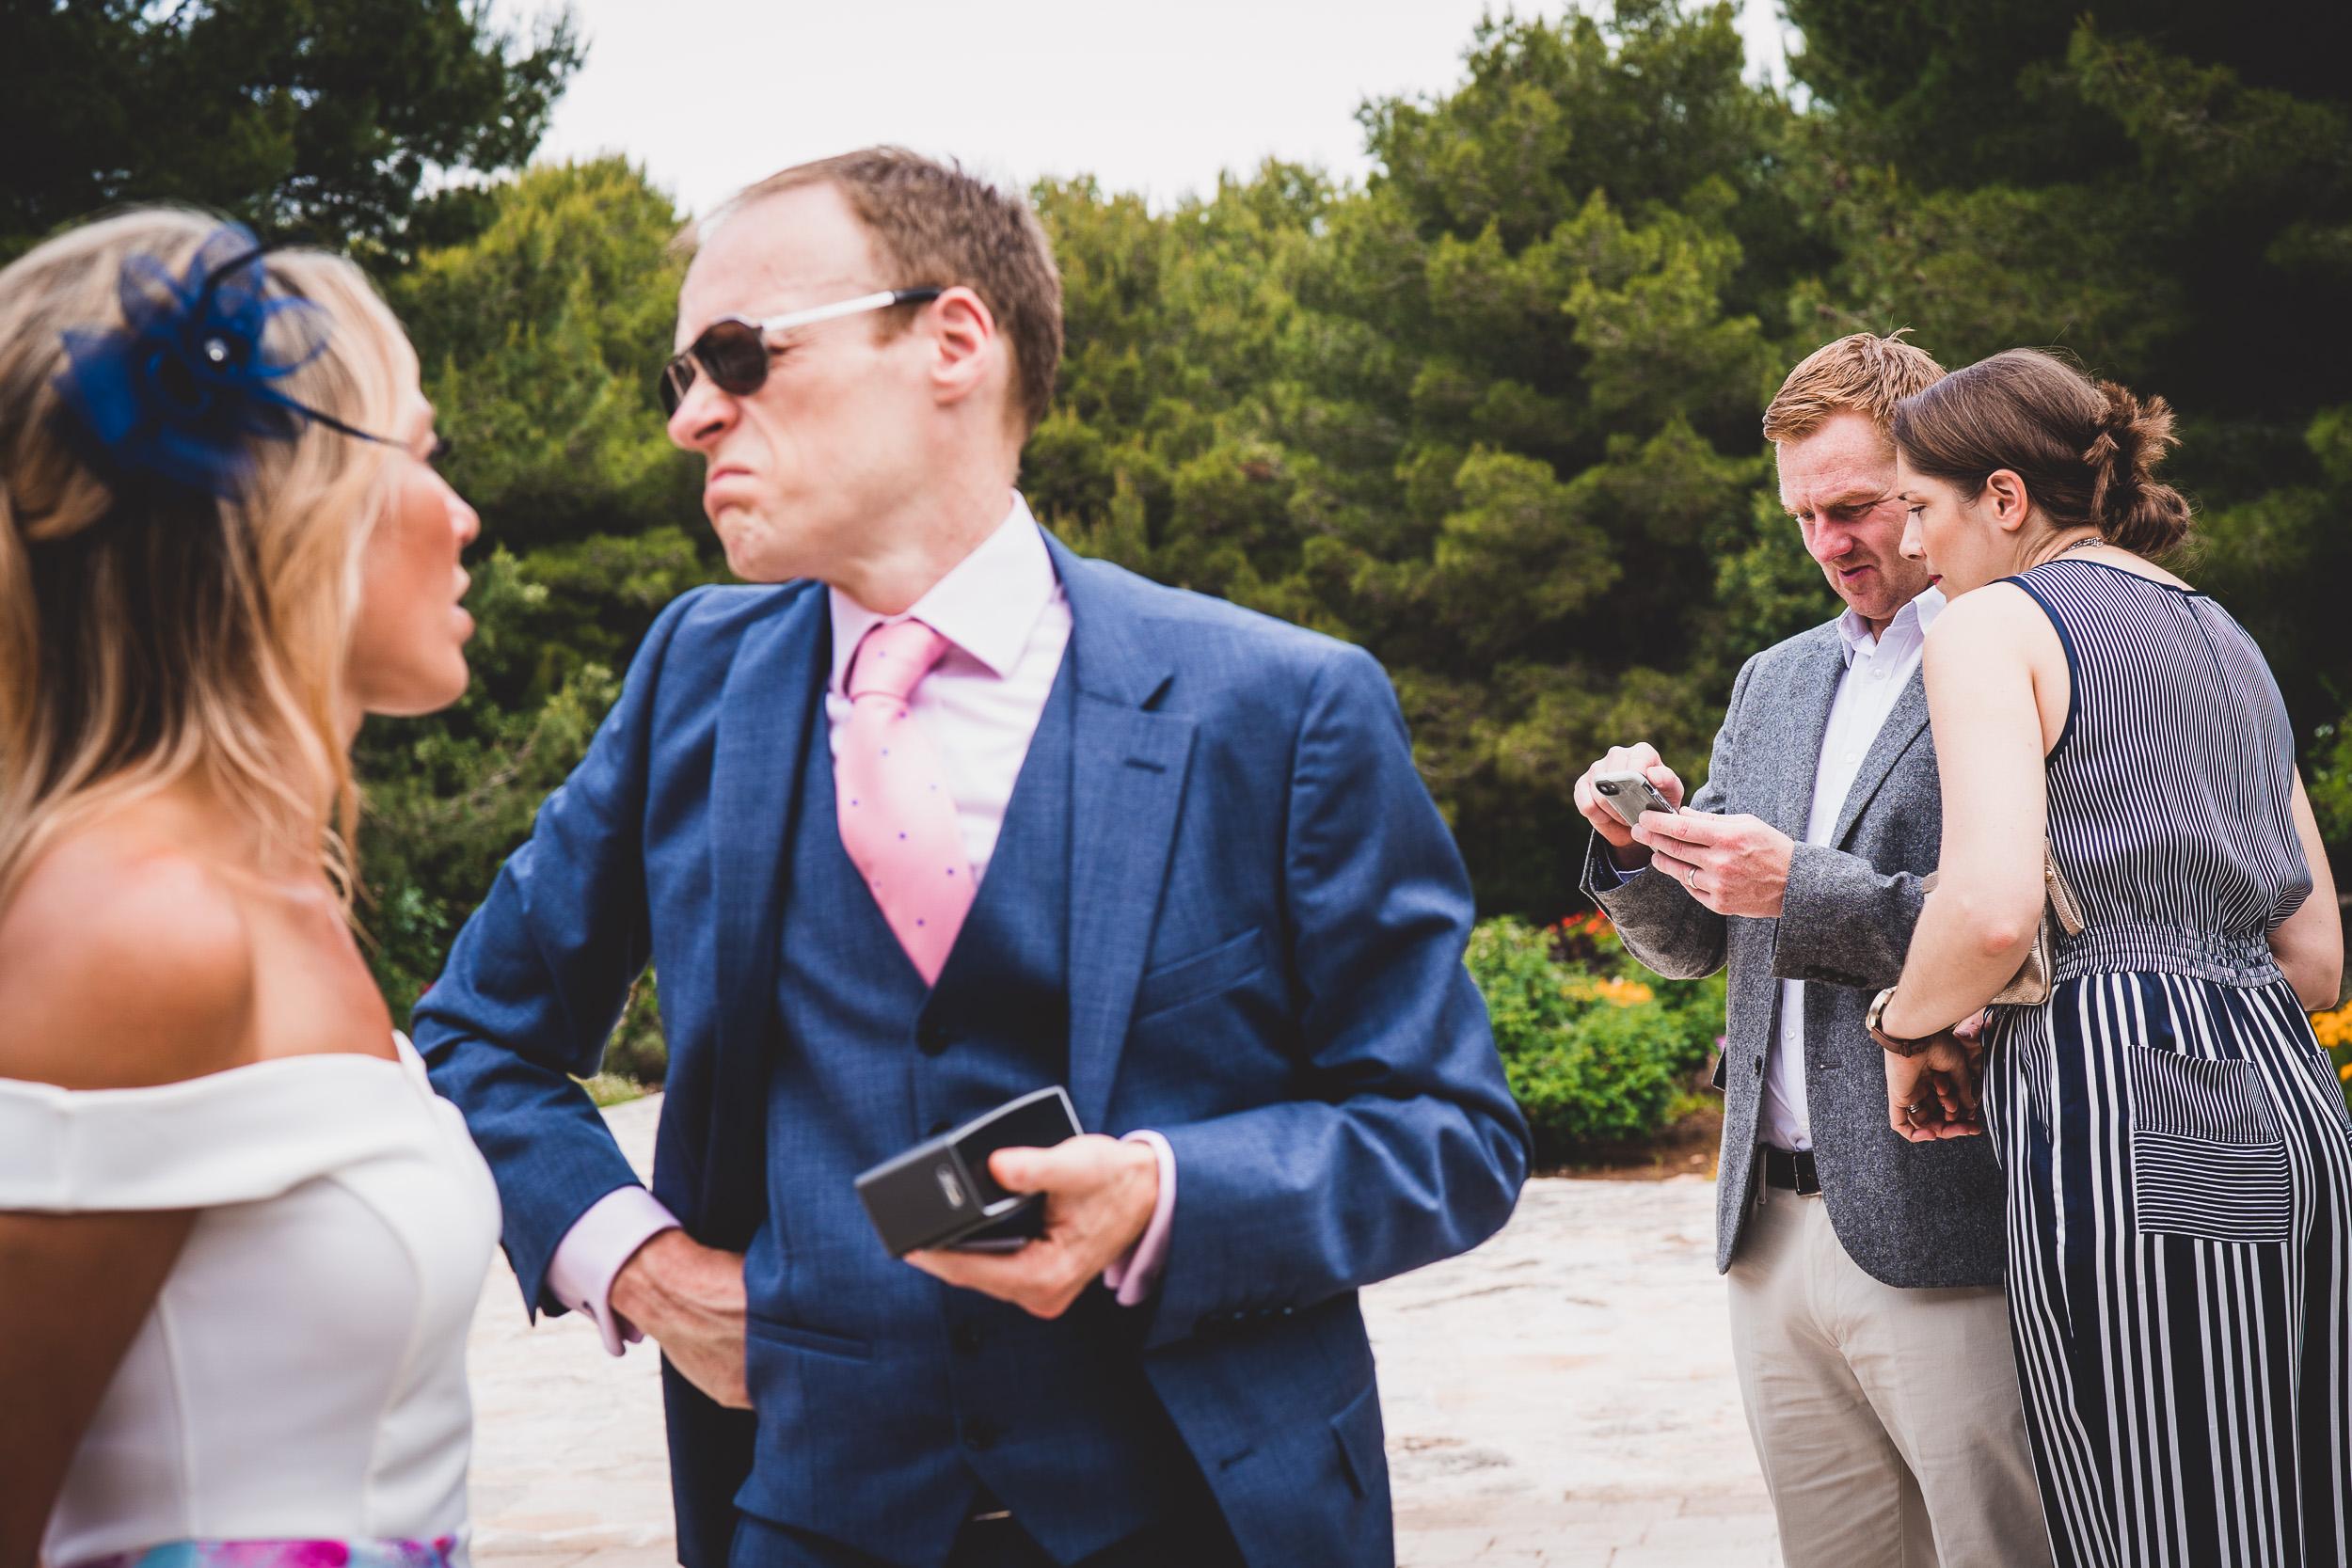 Destination wedding photography | Anna & Nigel destination wedding photography 020